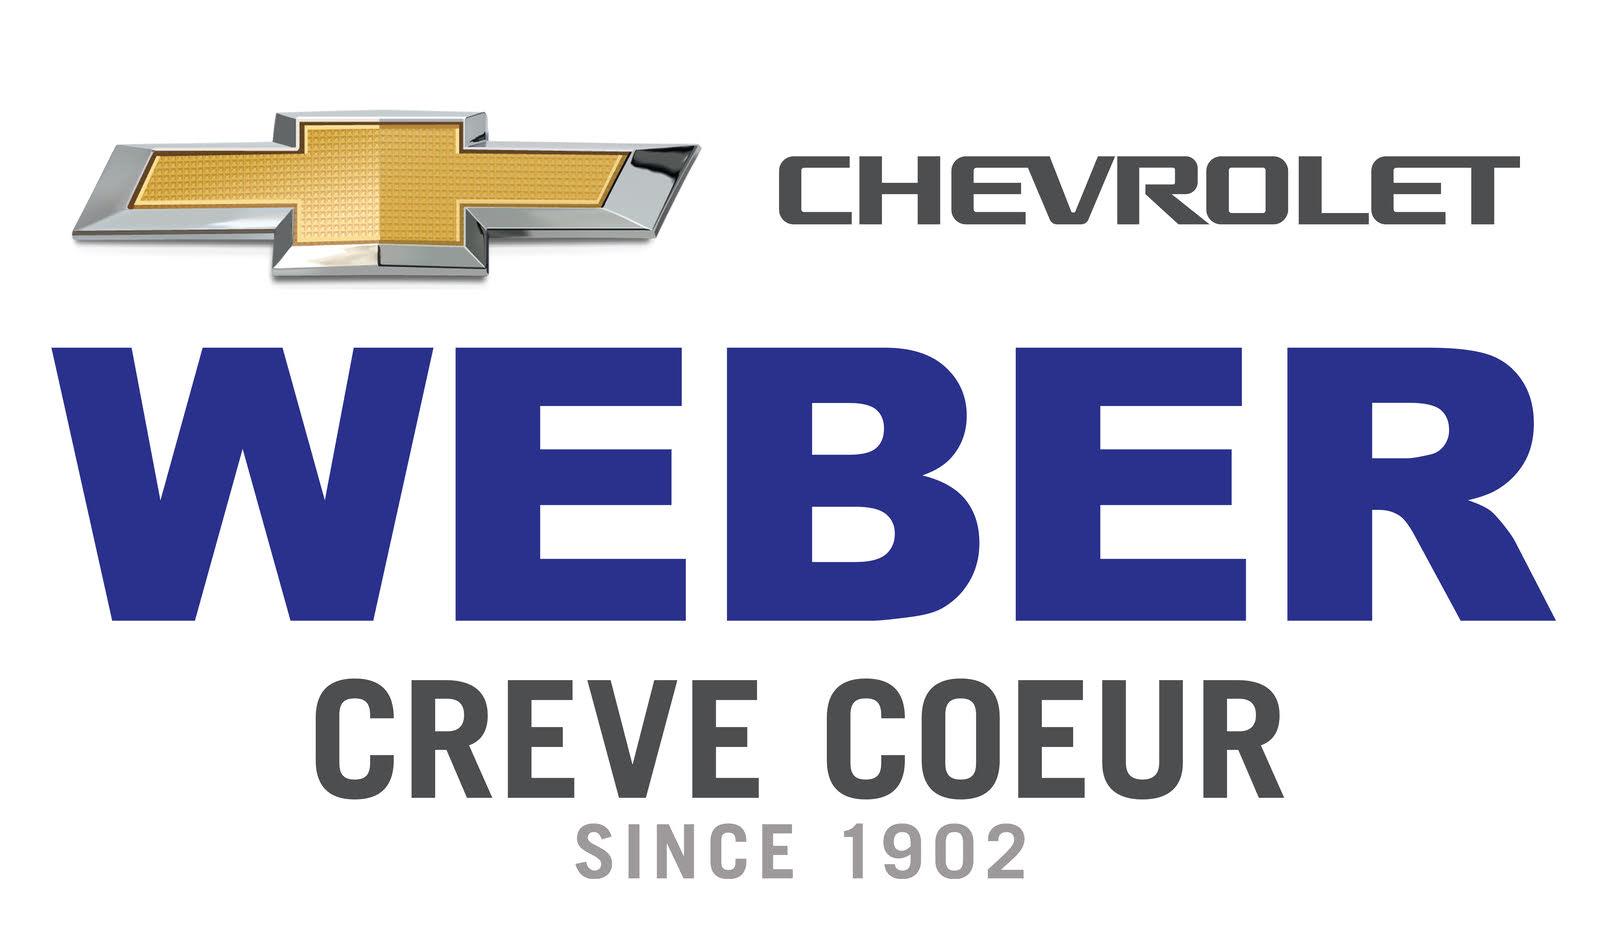 88564a90a2 Weber Chevrolet Creve Coeur - Creve Coeur